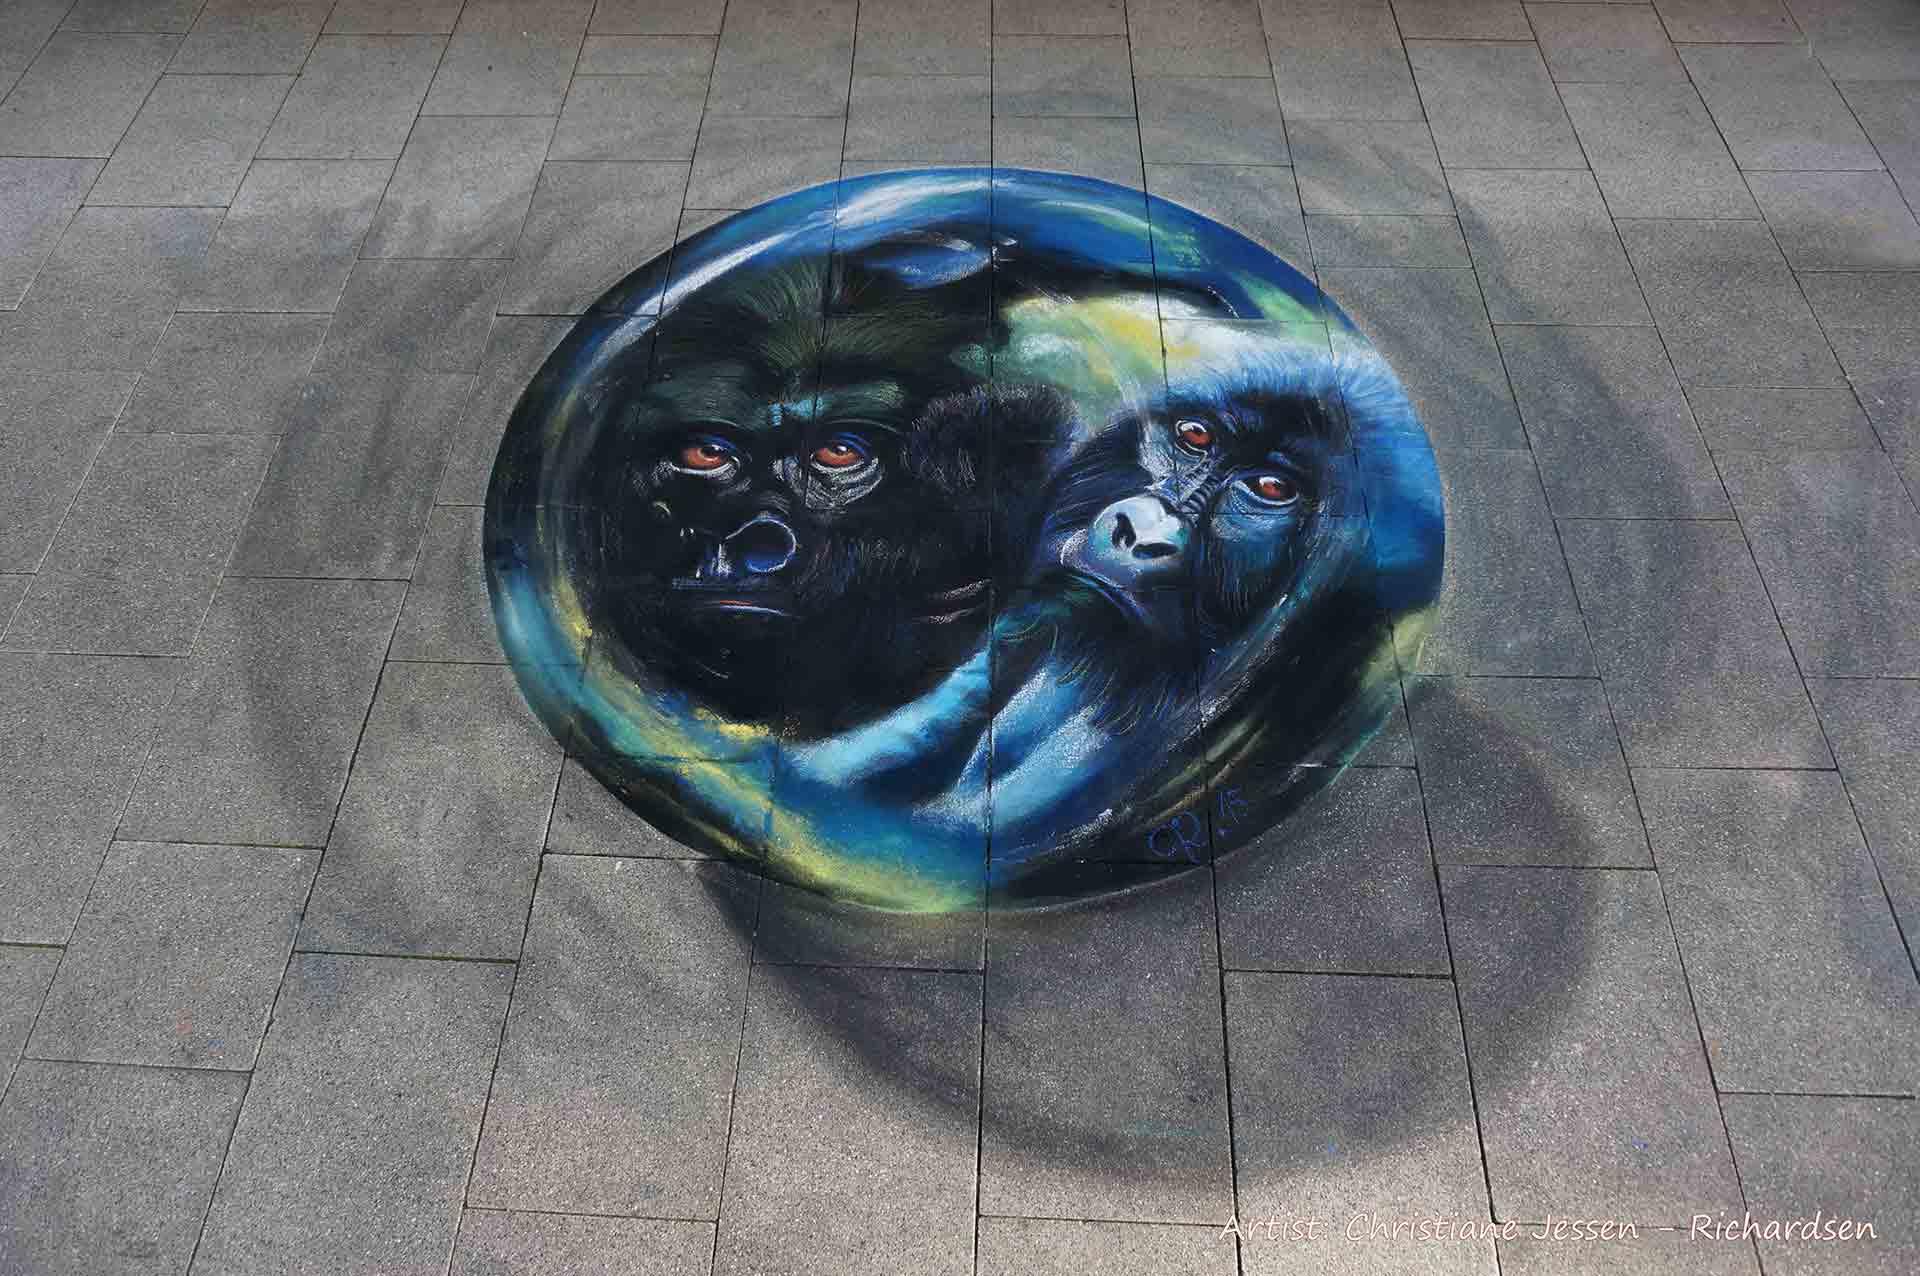 Straßenmalerei Gorilla